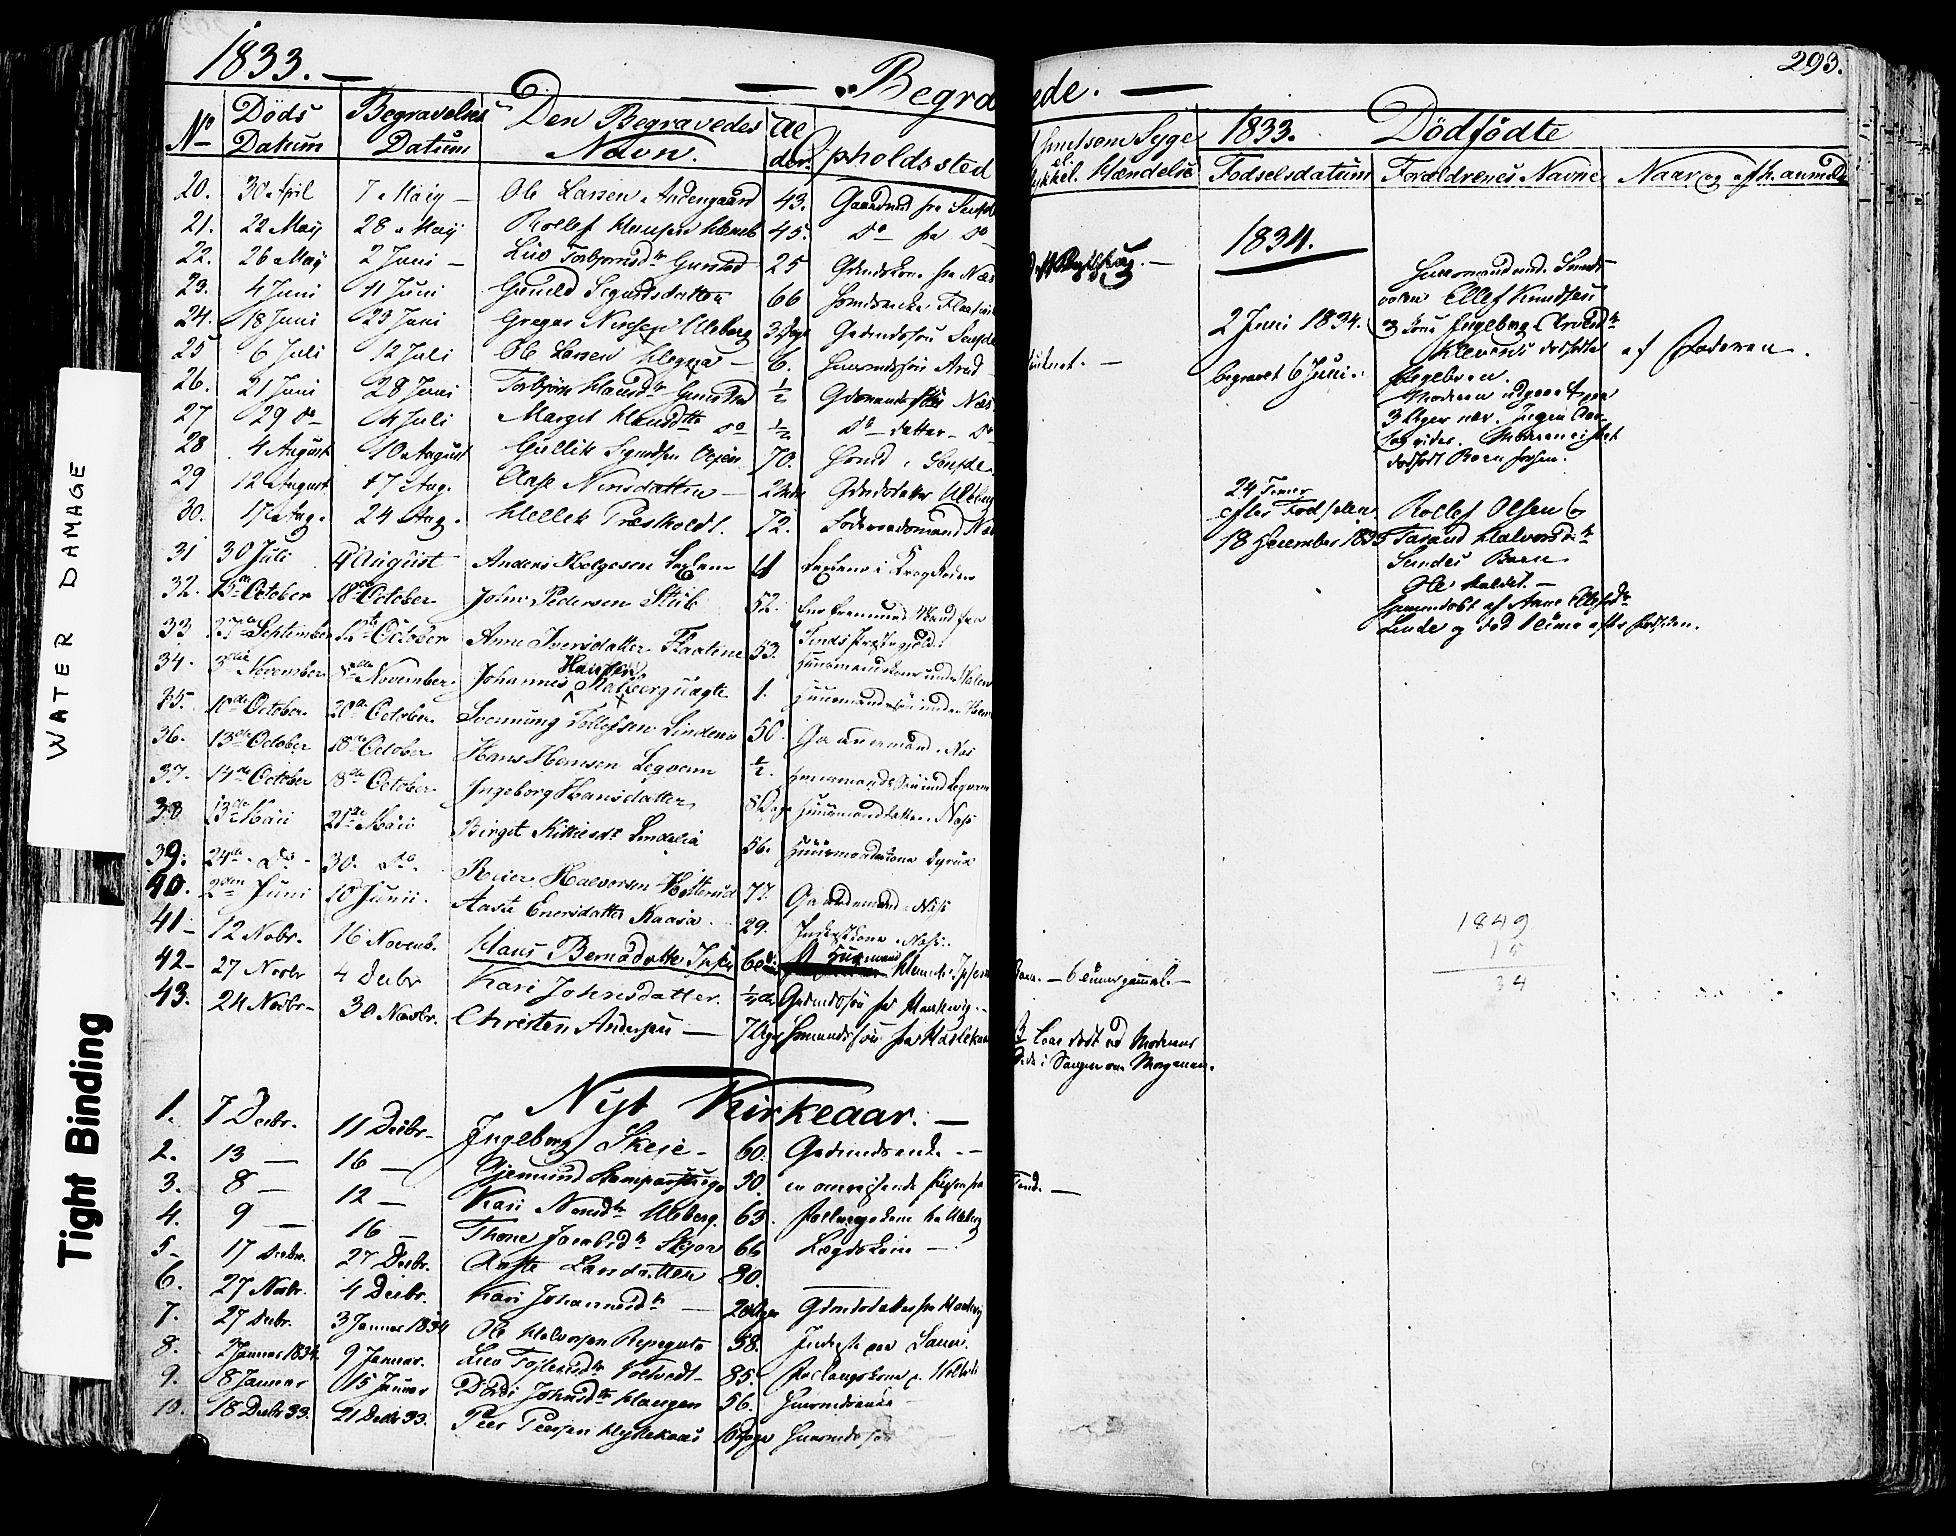 SAKO, Sauherad kirkebøker, F/Fa/L0006: Ministerialbok nr. I 6, 1827-1850, s. 293